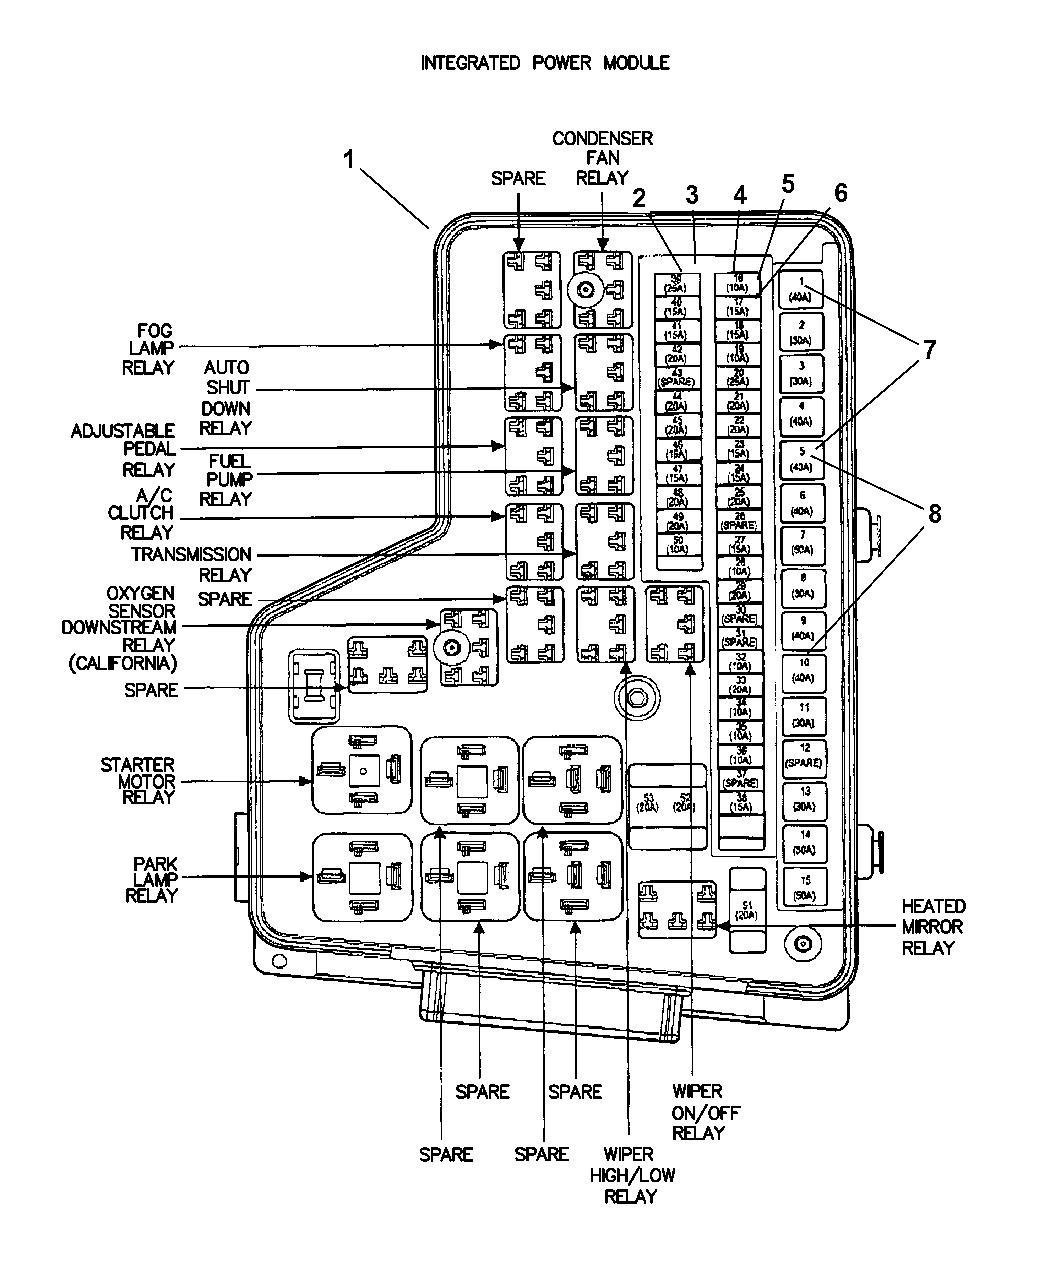 2008 Dodge Ram 5500 Power Distribution Center